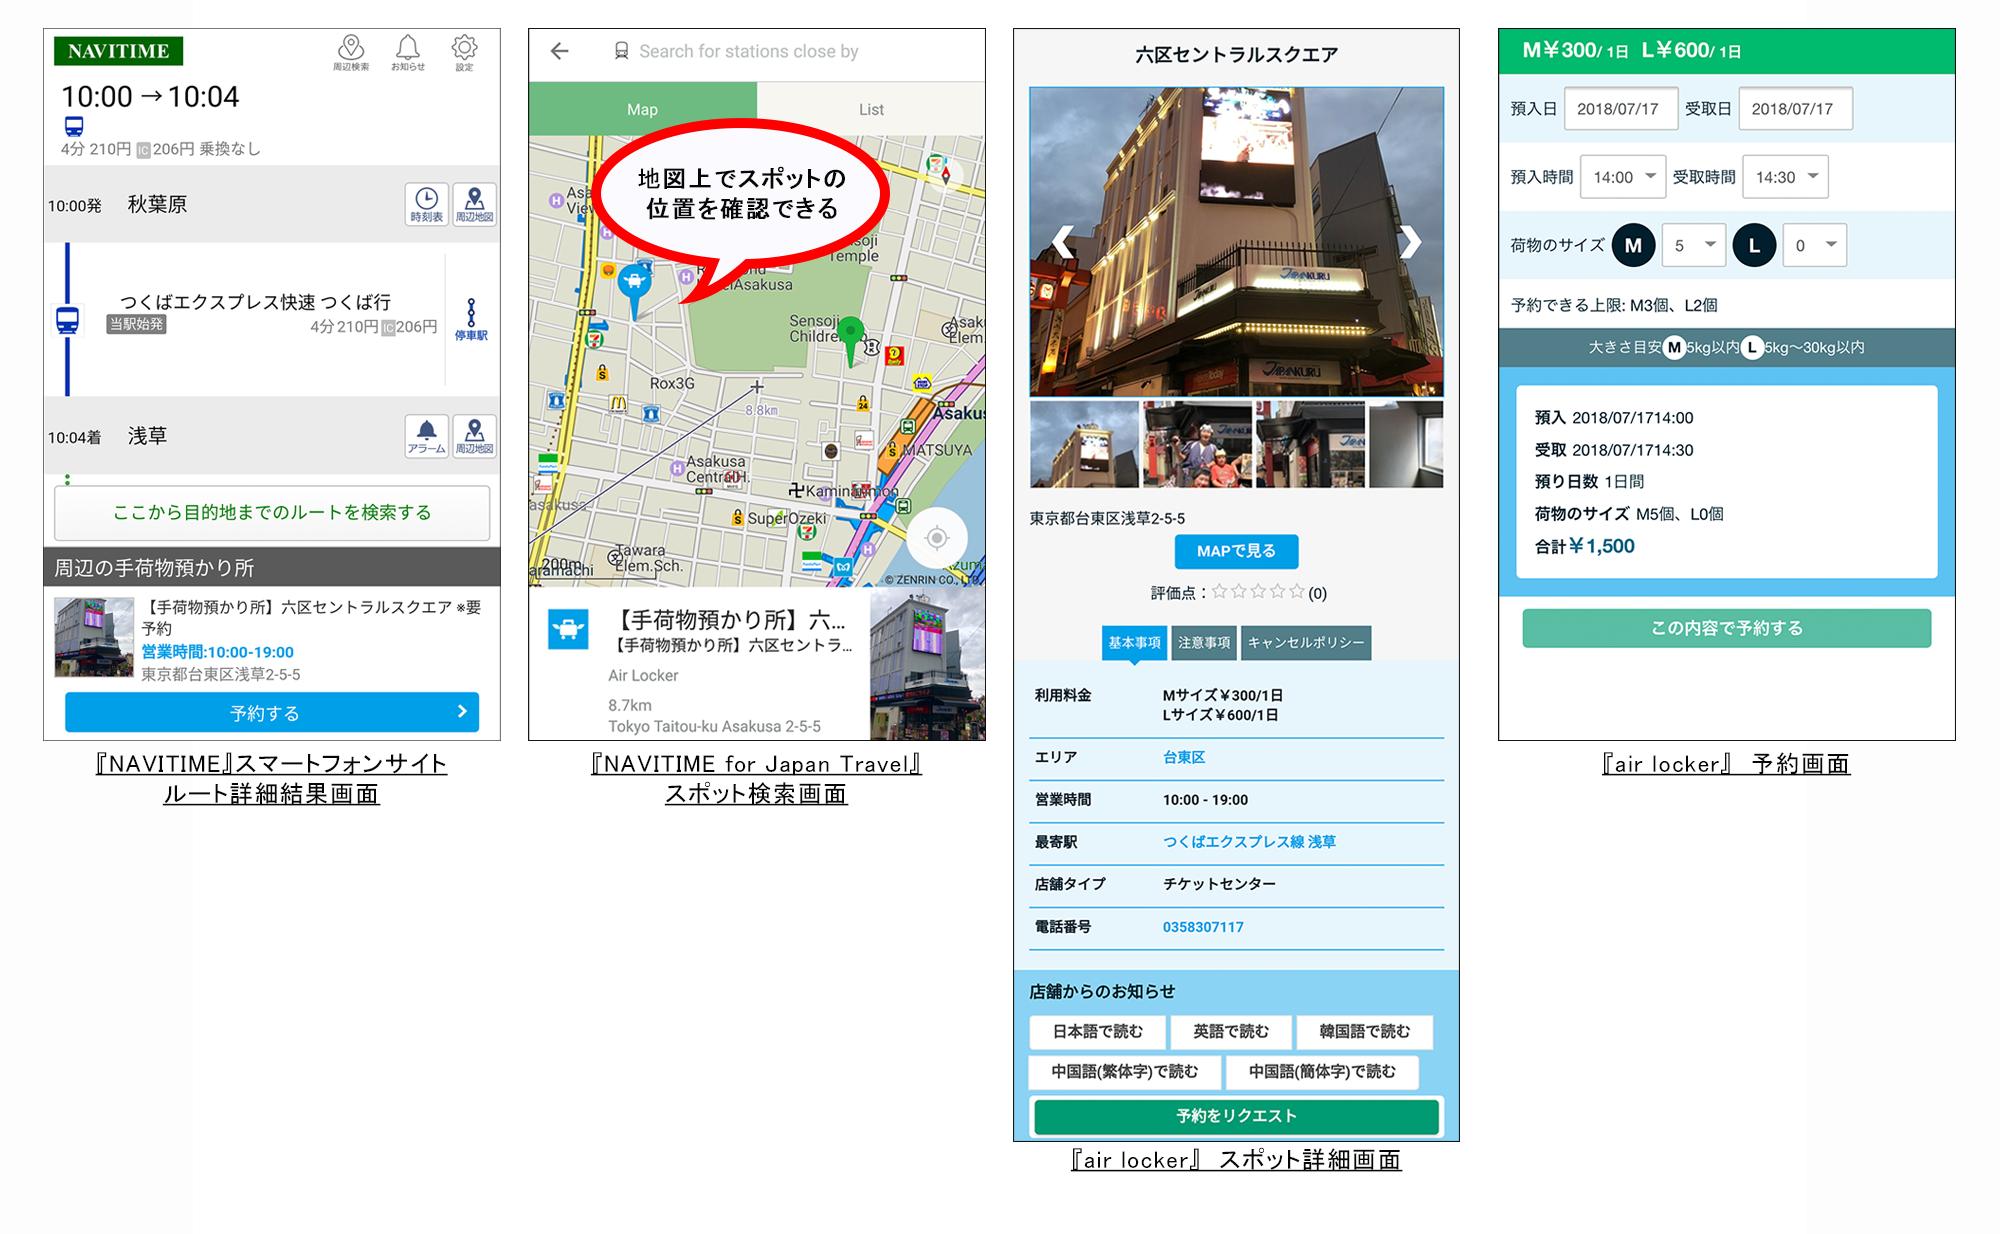 http://corporate.navitime.co.jp/topics/ee9e6b506e4128f8ef23454bf069238f739686e6.png